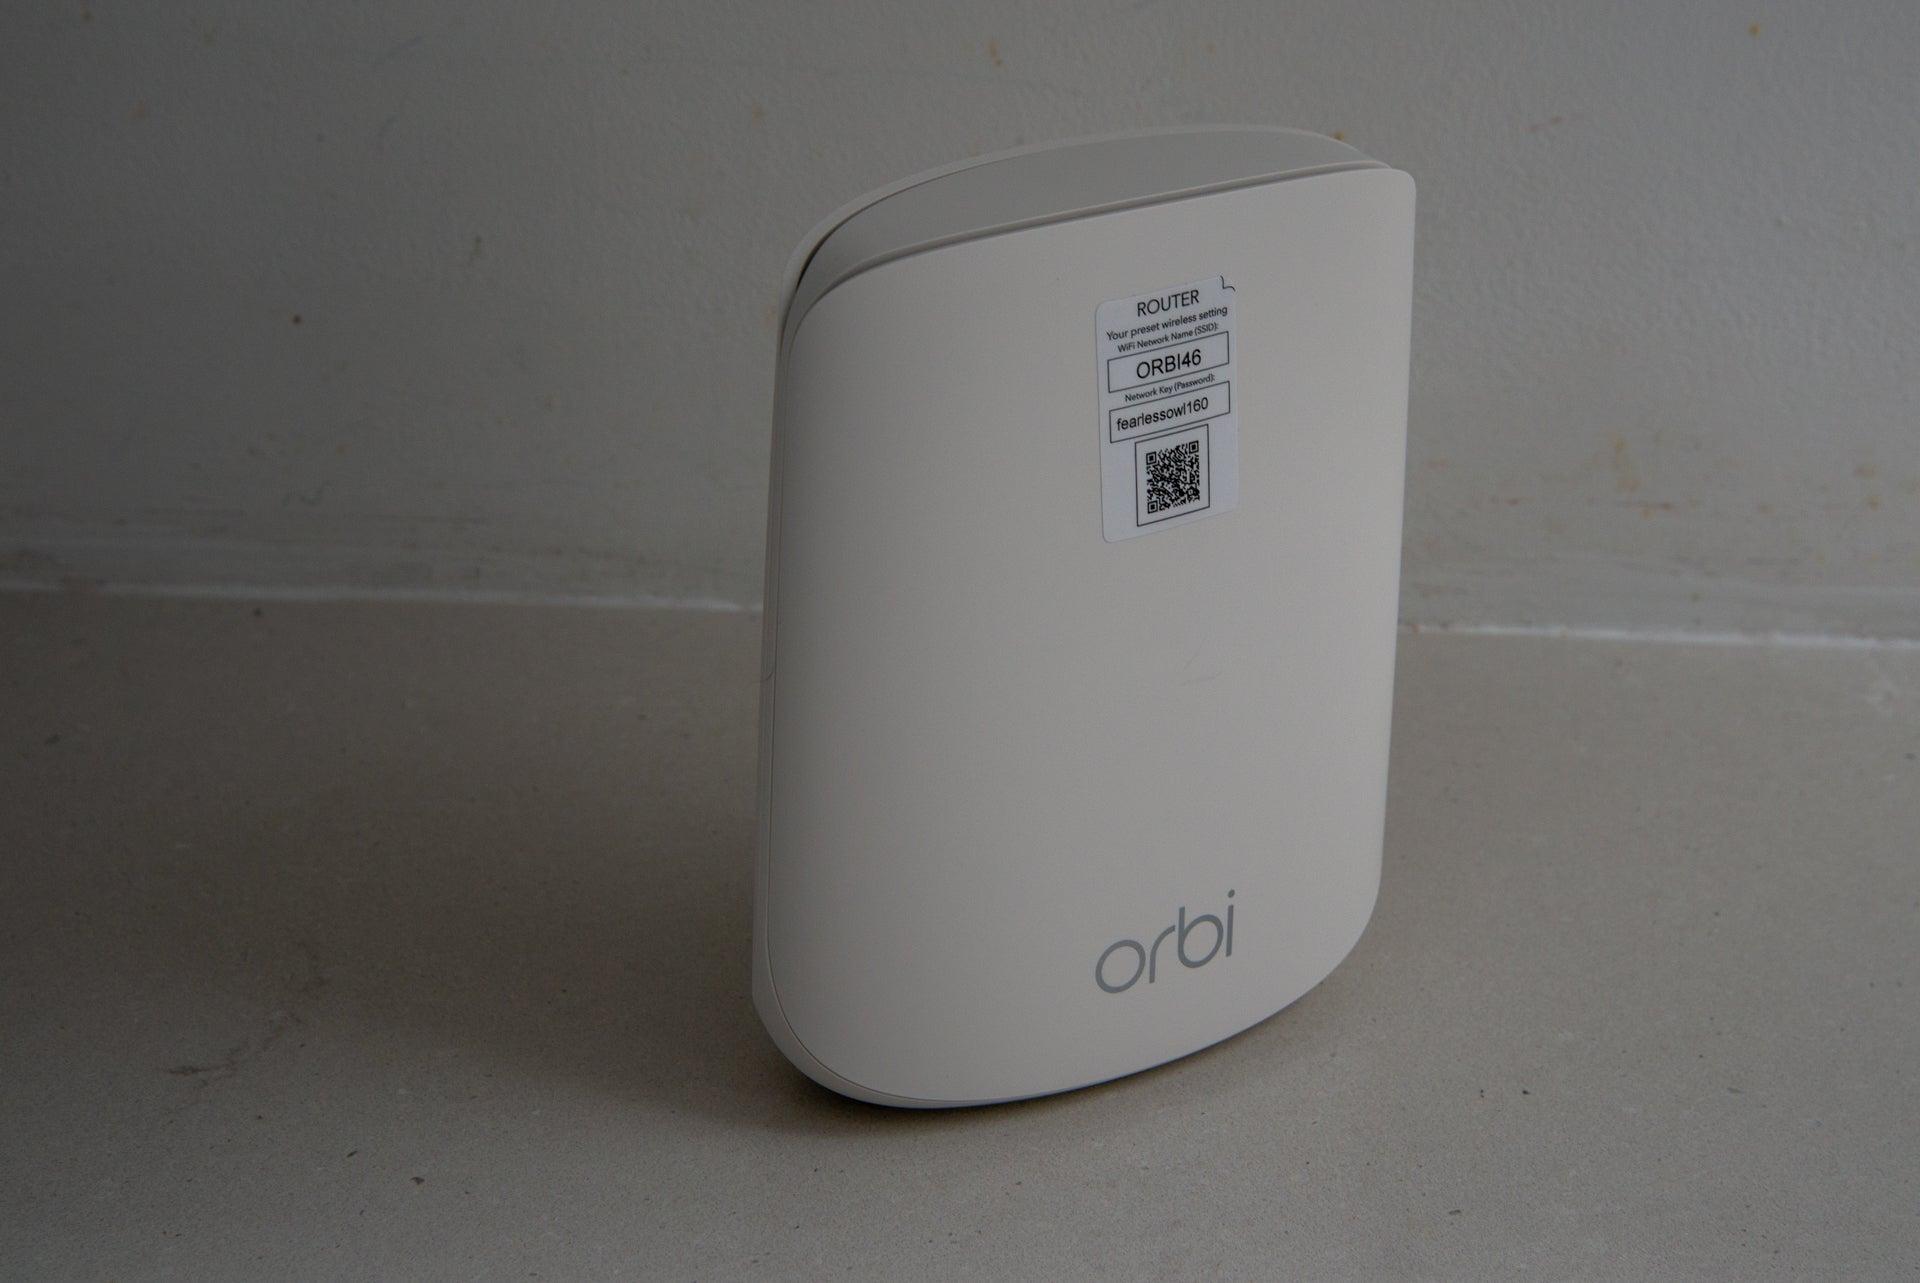 Netgear Orbi WiFi 6 Dual-band Mesh System (RBK353) router